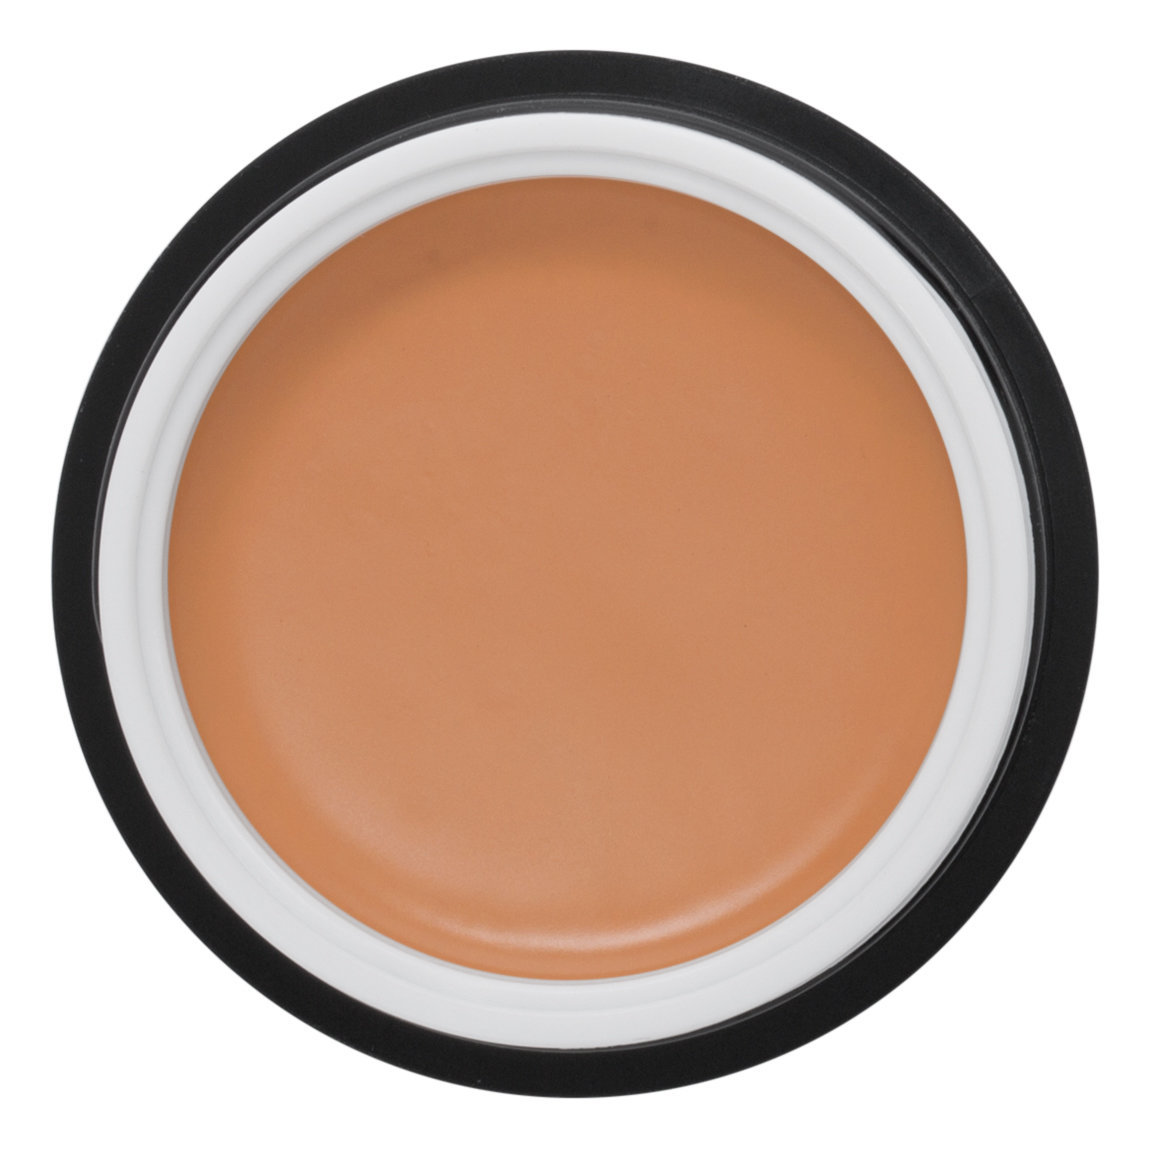 IT Cosmetics  Bye Bye Under Eye Concealing Pot Medium/Tan